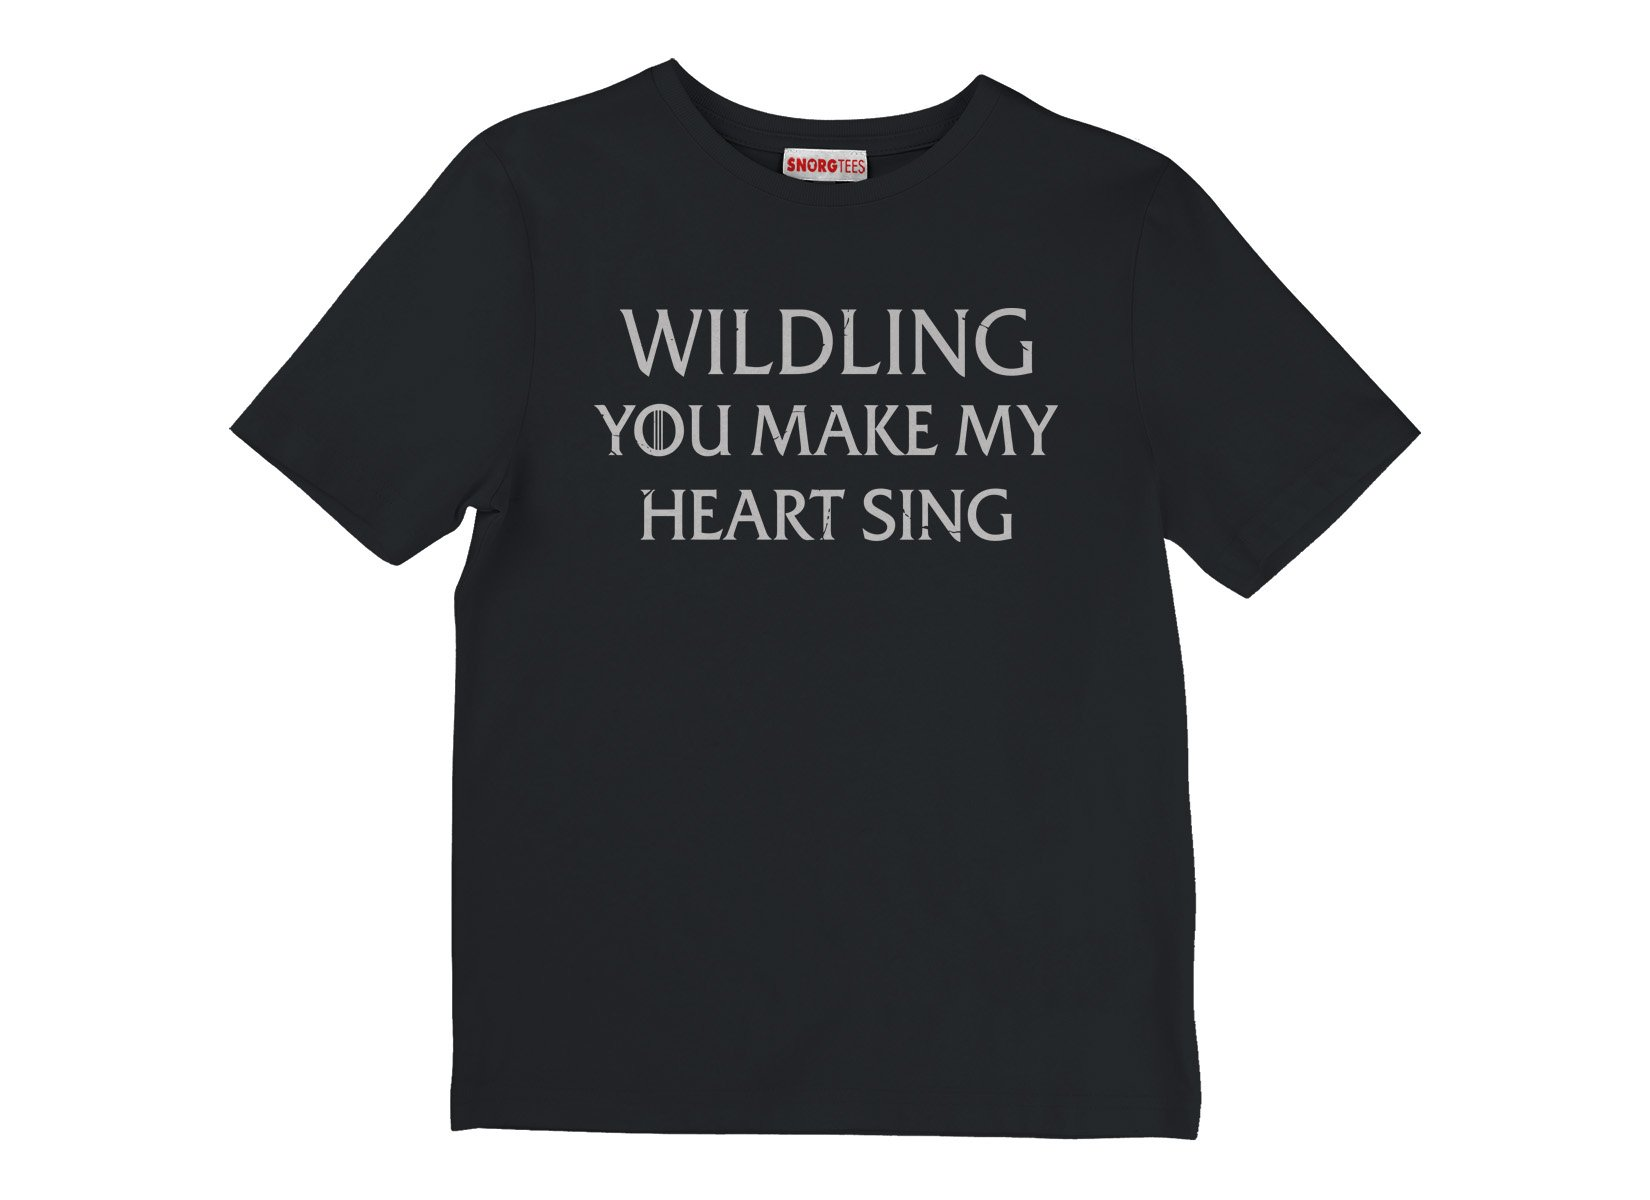 Wildling You Make My Heart Sing on Kids T-Shirt